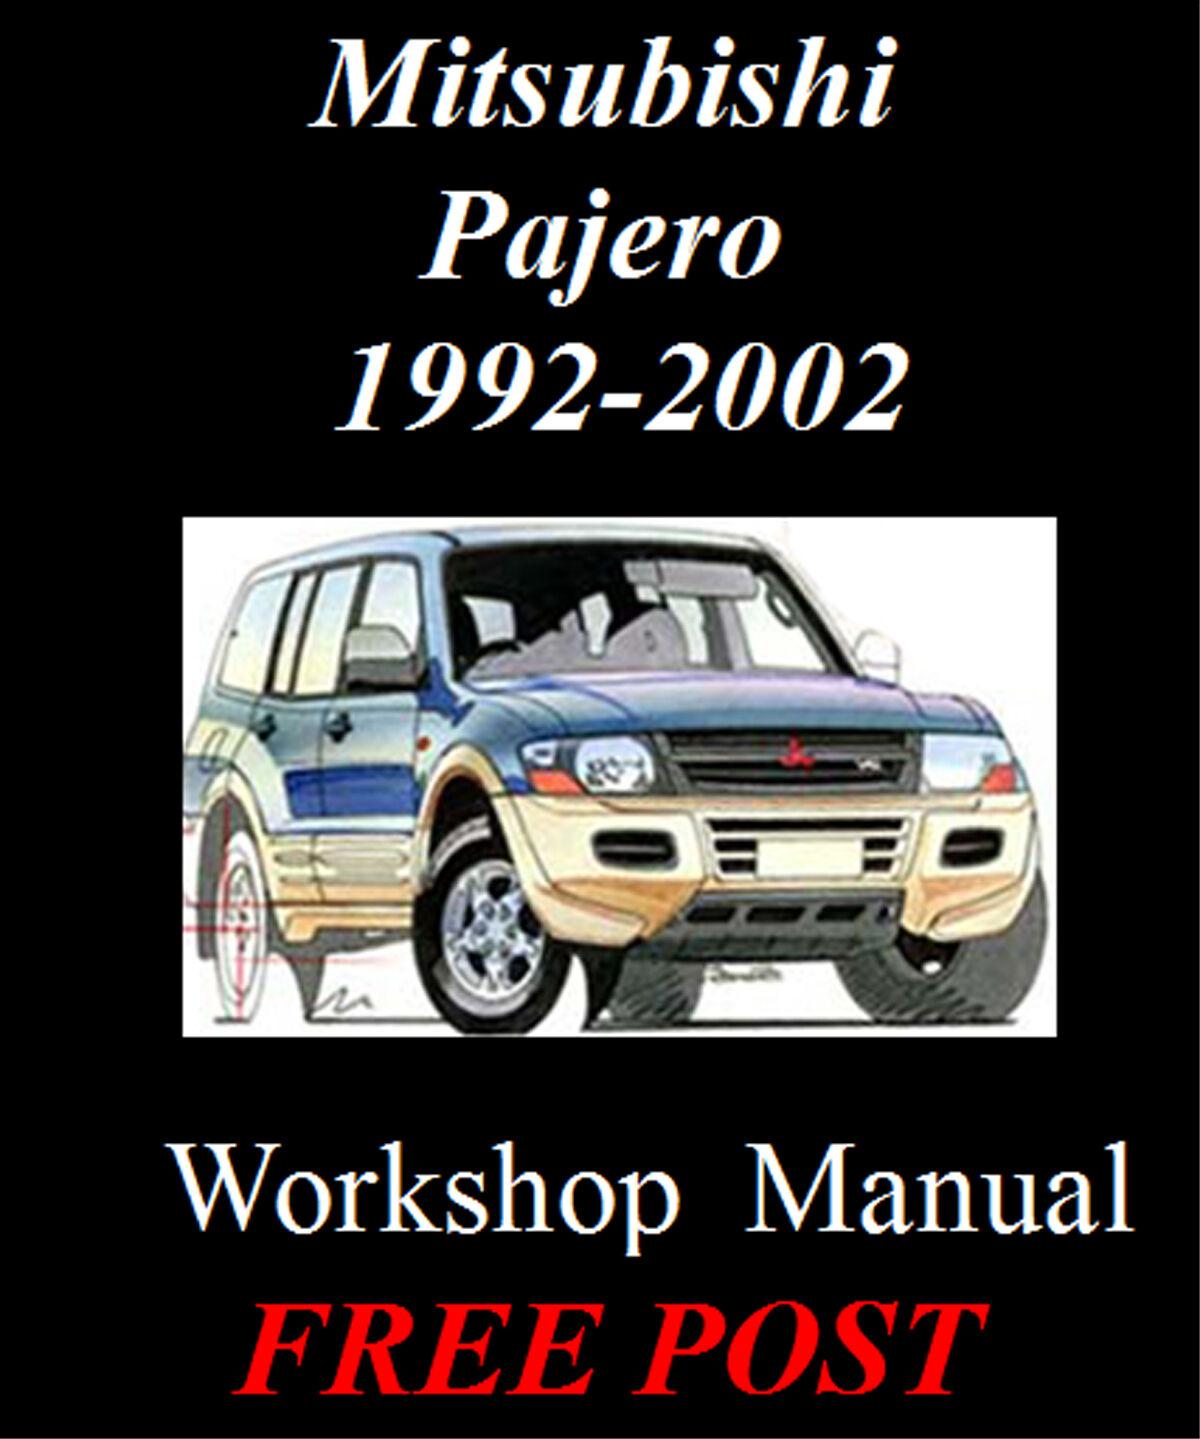 MITSUBISHI PAJERO 1992 - 2002 WORKSHOP SERVICE REPAIR MANUAL ON CD